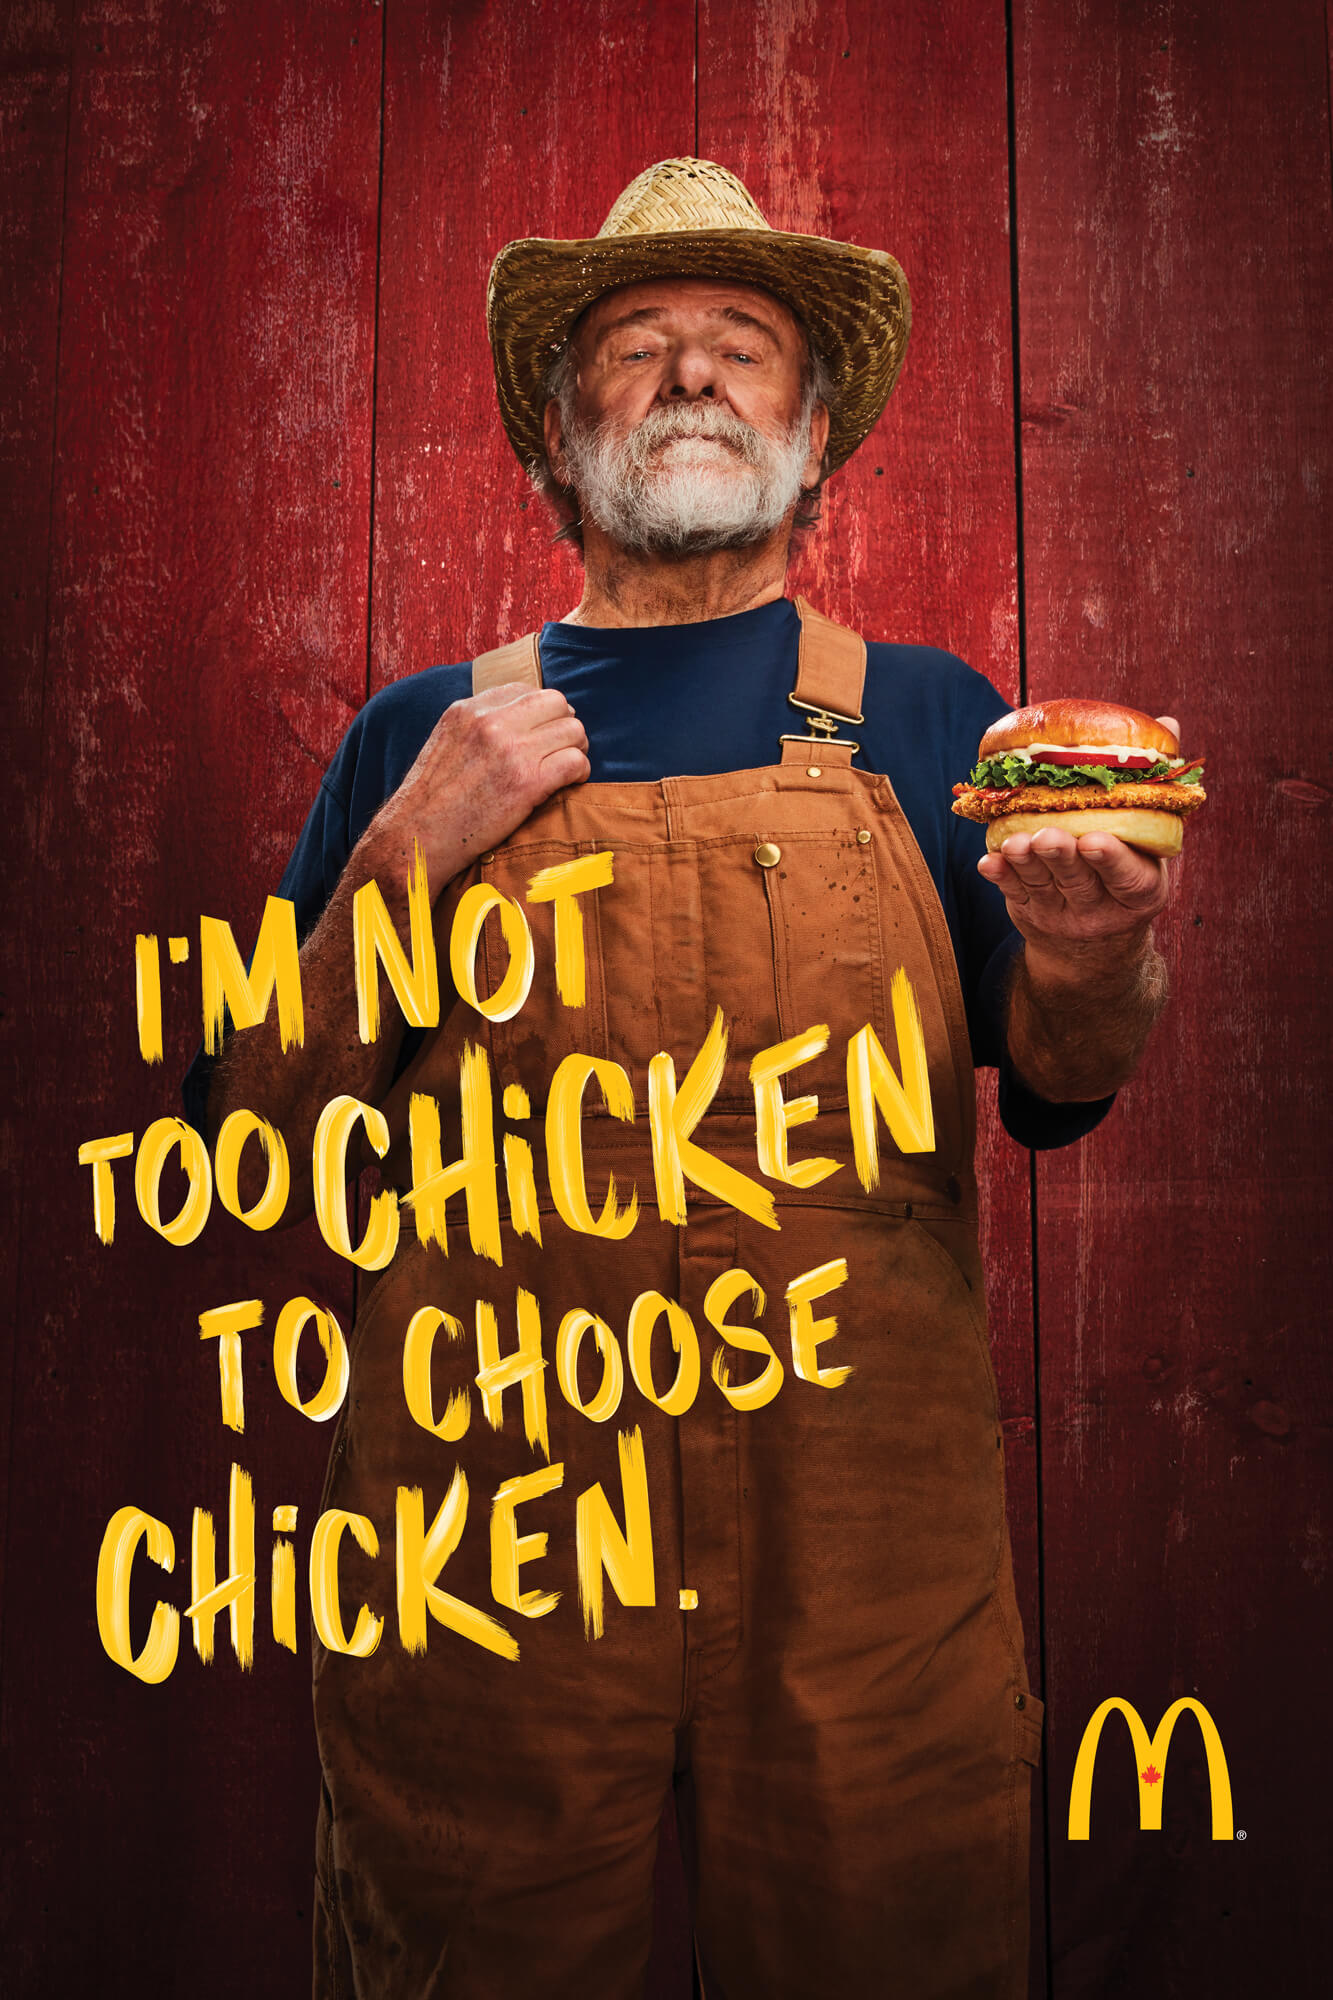 Unified Content, Unified Content Toronto, Aaron Cobb, McDonalds, Advertising, Portrait, Product, Chicken, Chicken Burger, Chicken People, Food, Product, Advertising